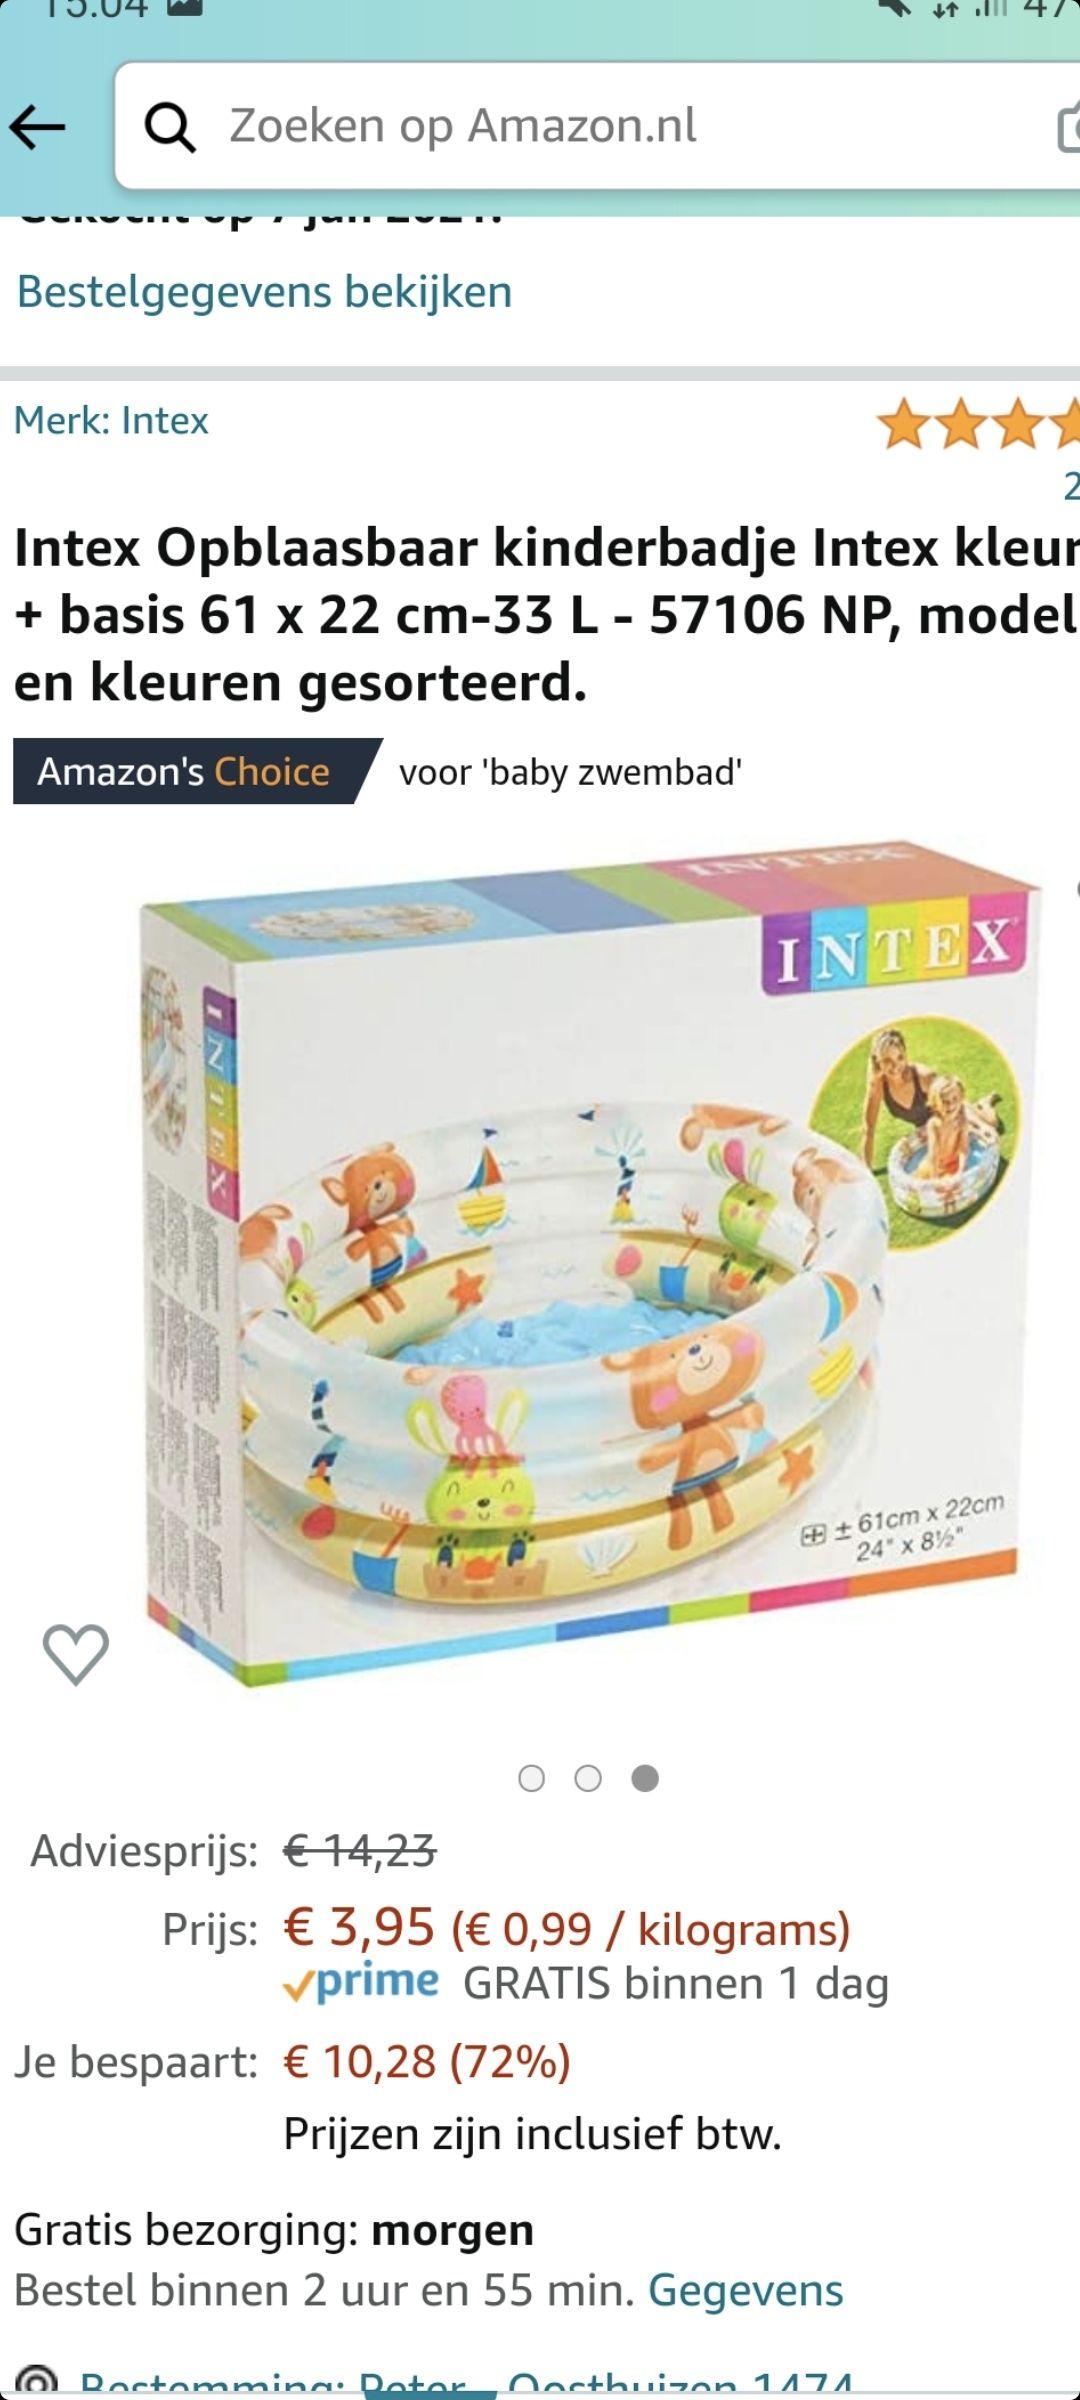 Intex Opblaasbaar kinderbadje (of voetenbadje voor ouders:p)